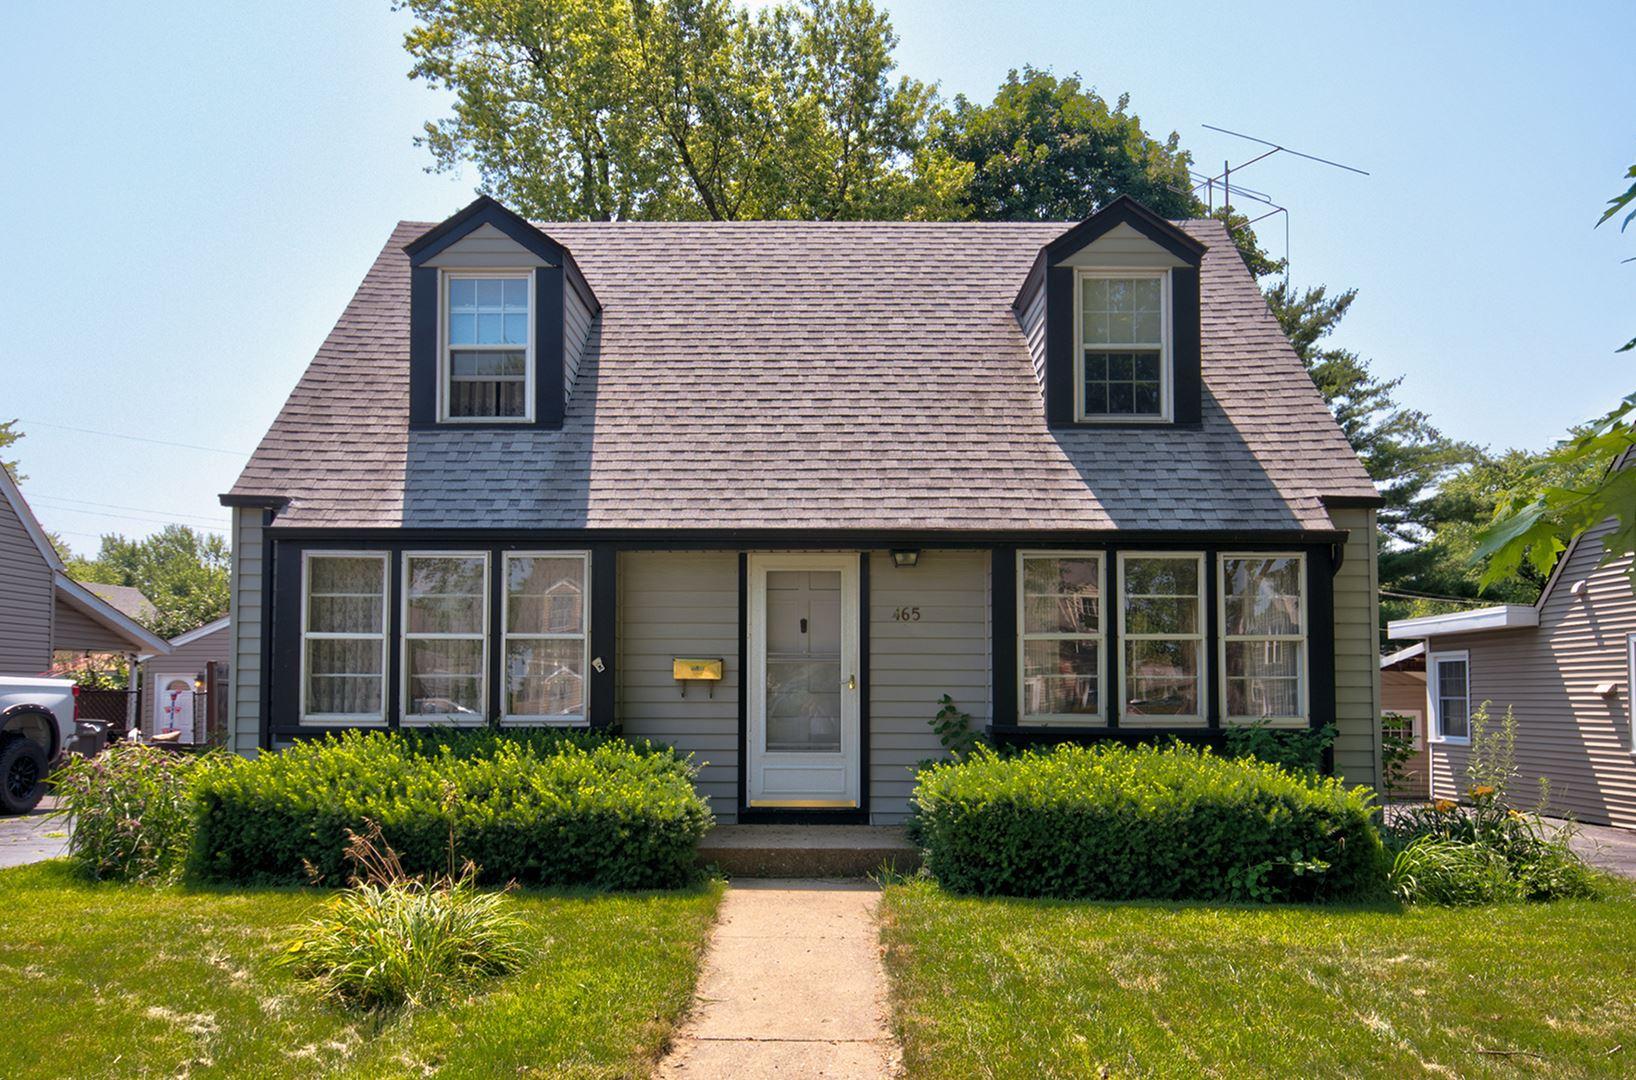 465 Miller Drive, Elgin, IL 60123 - #: 10773350